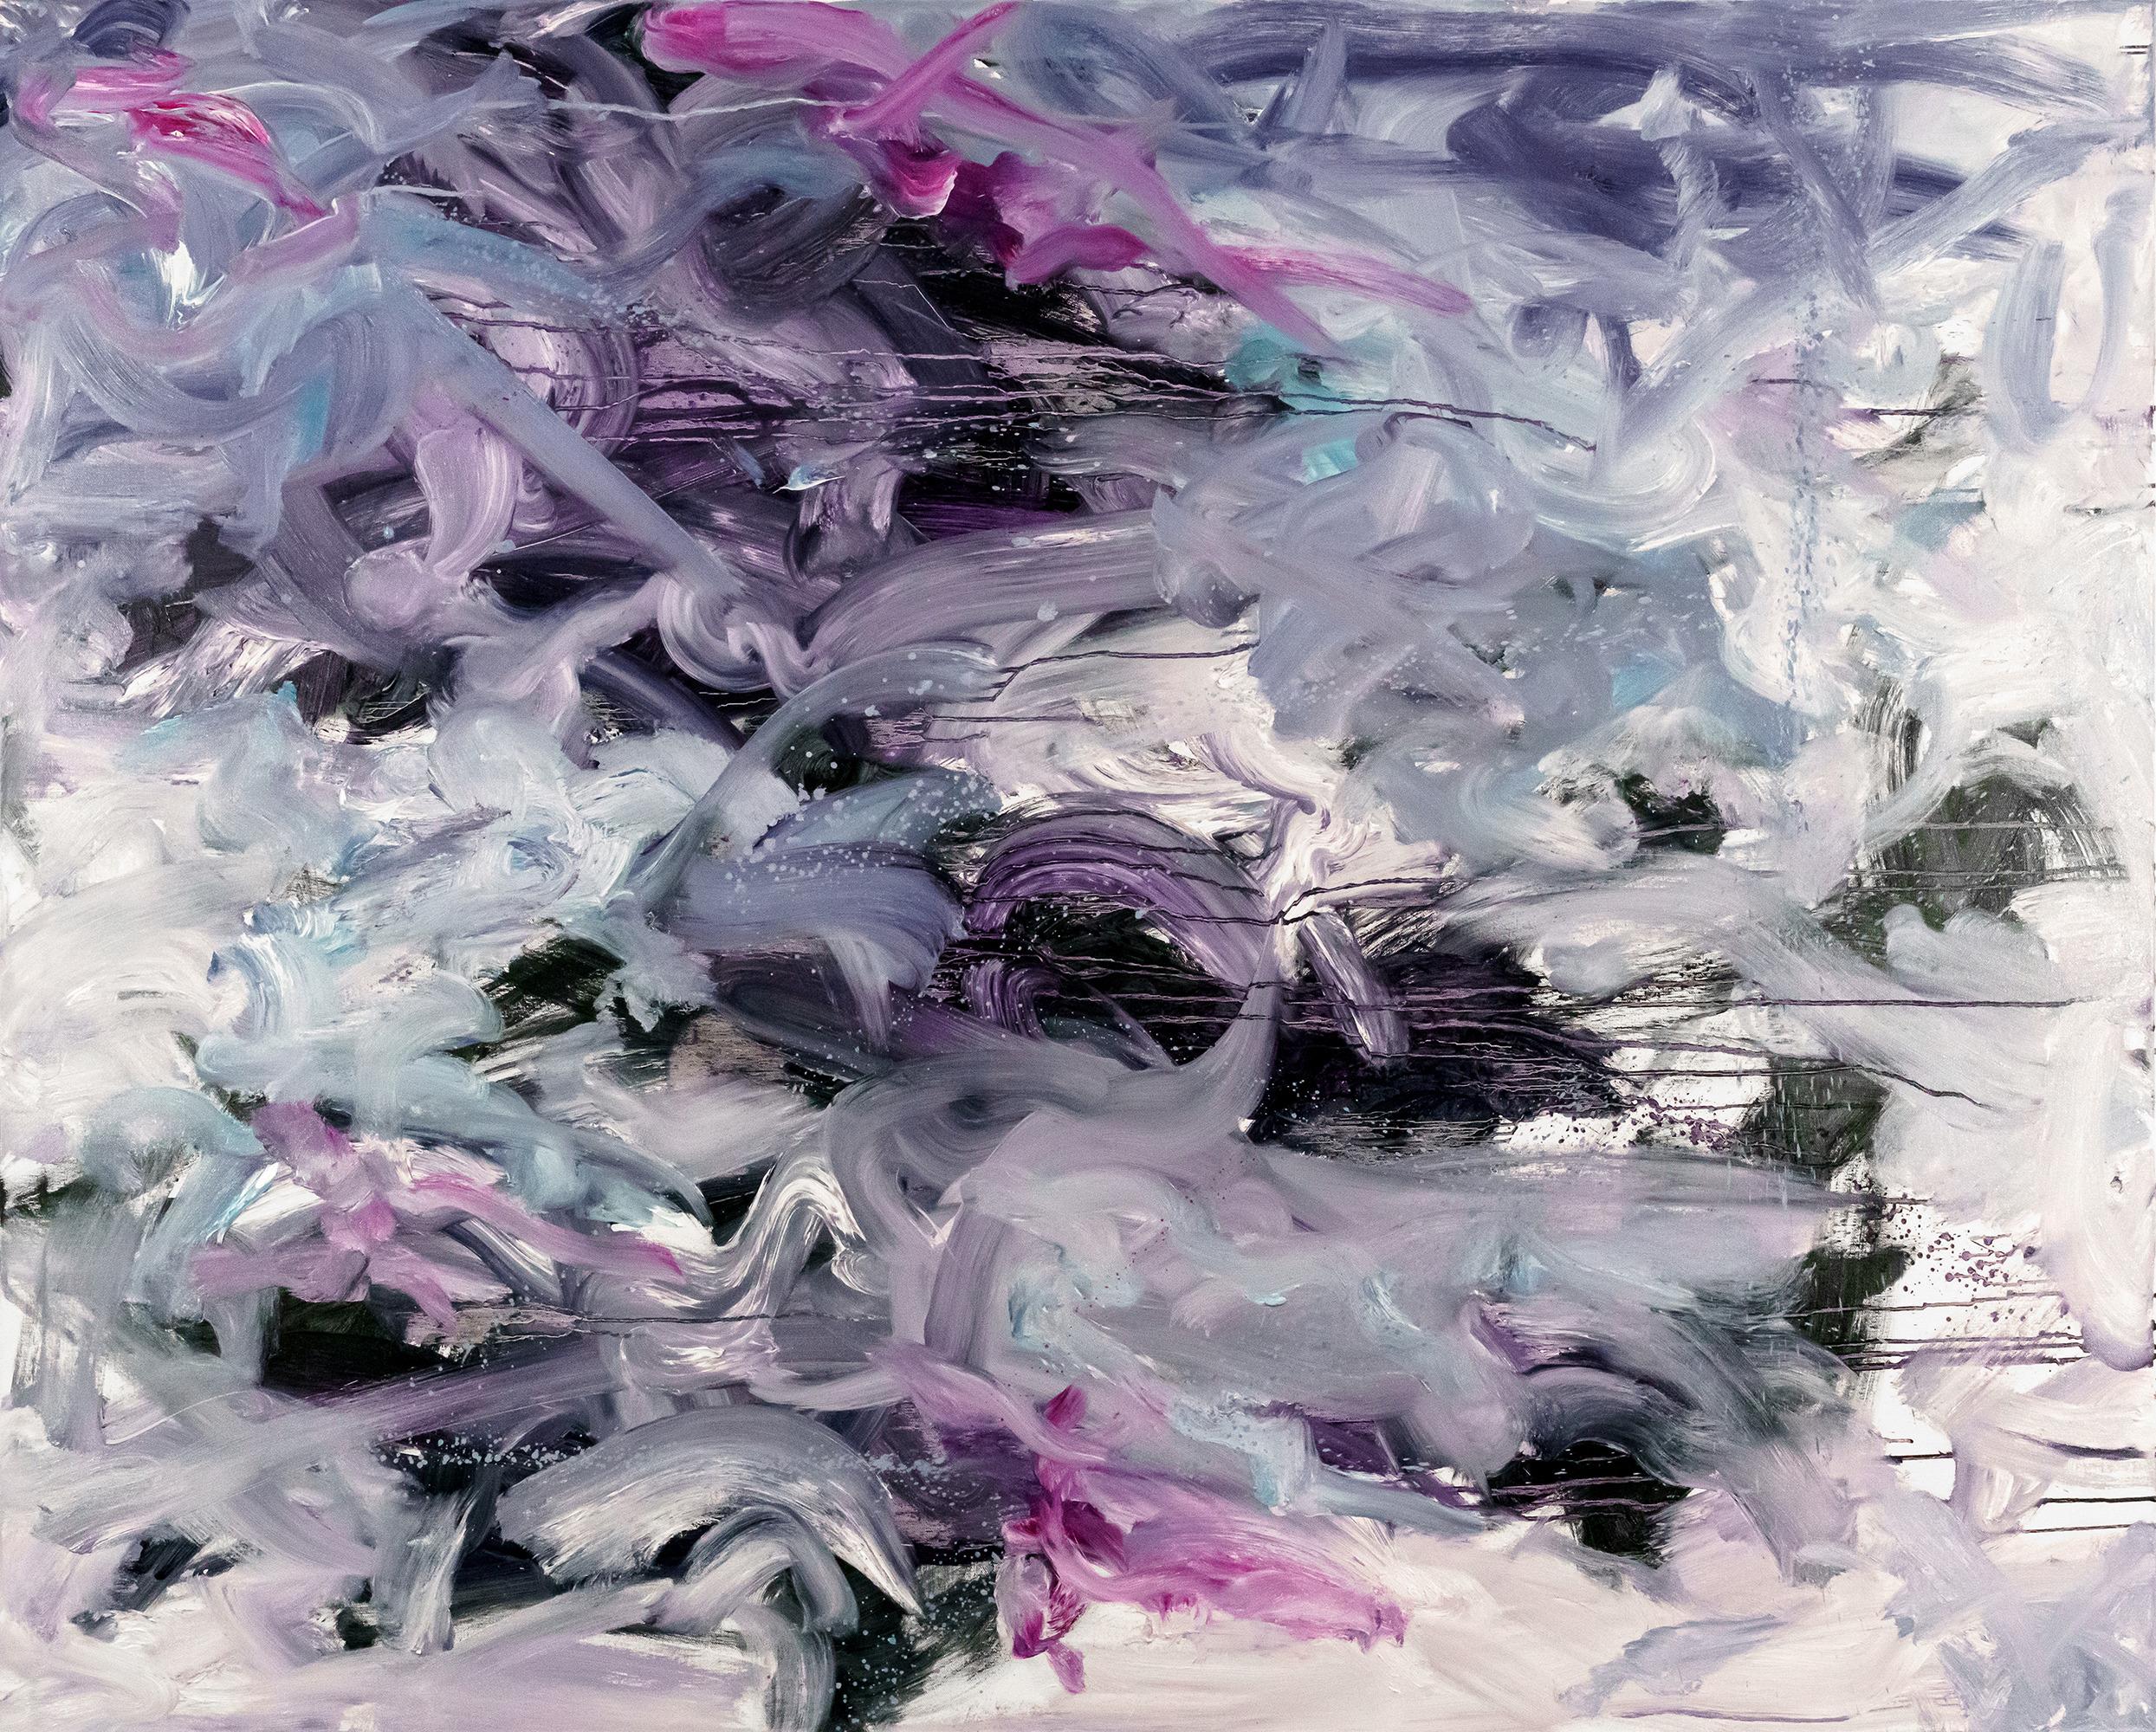 Katewilson.tellmeastory.paintingoncanvas.48x60inches.2020.lr v9bava